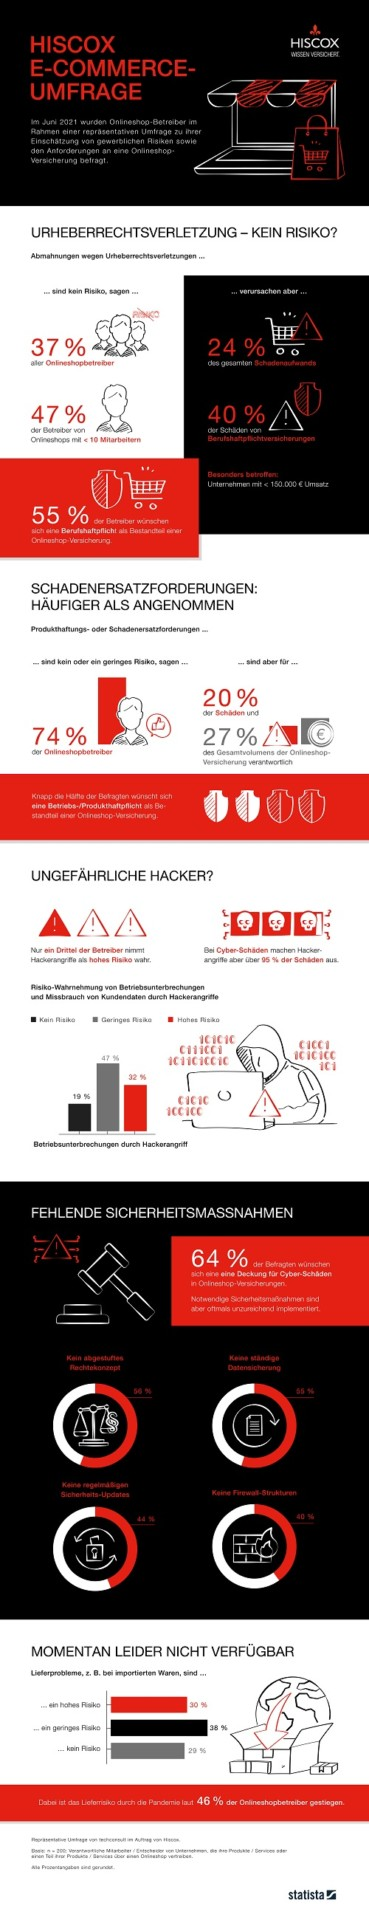 Hiscox E Commerce Umfrage Infografik